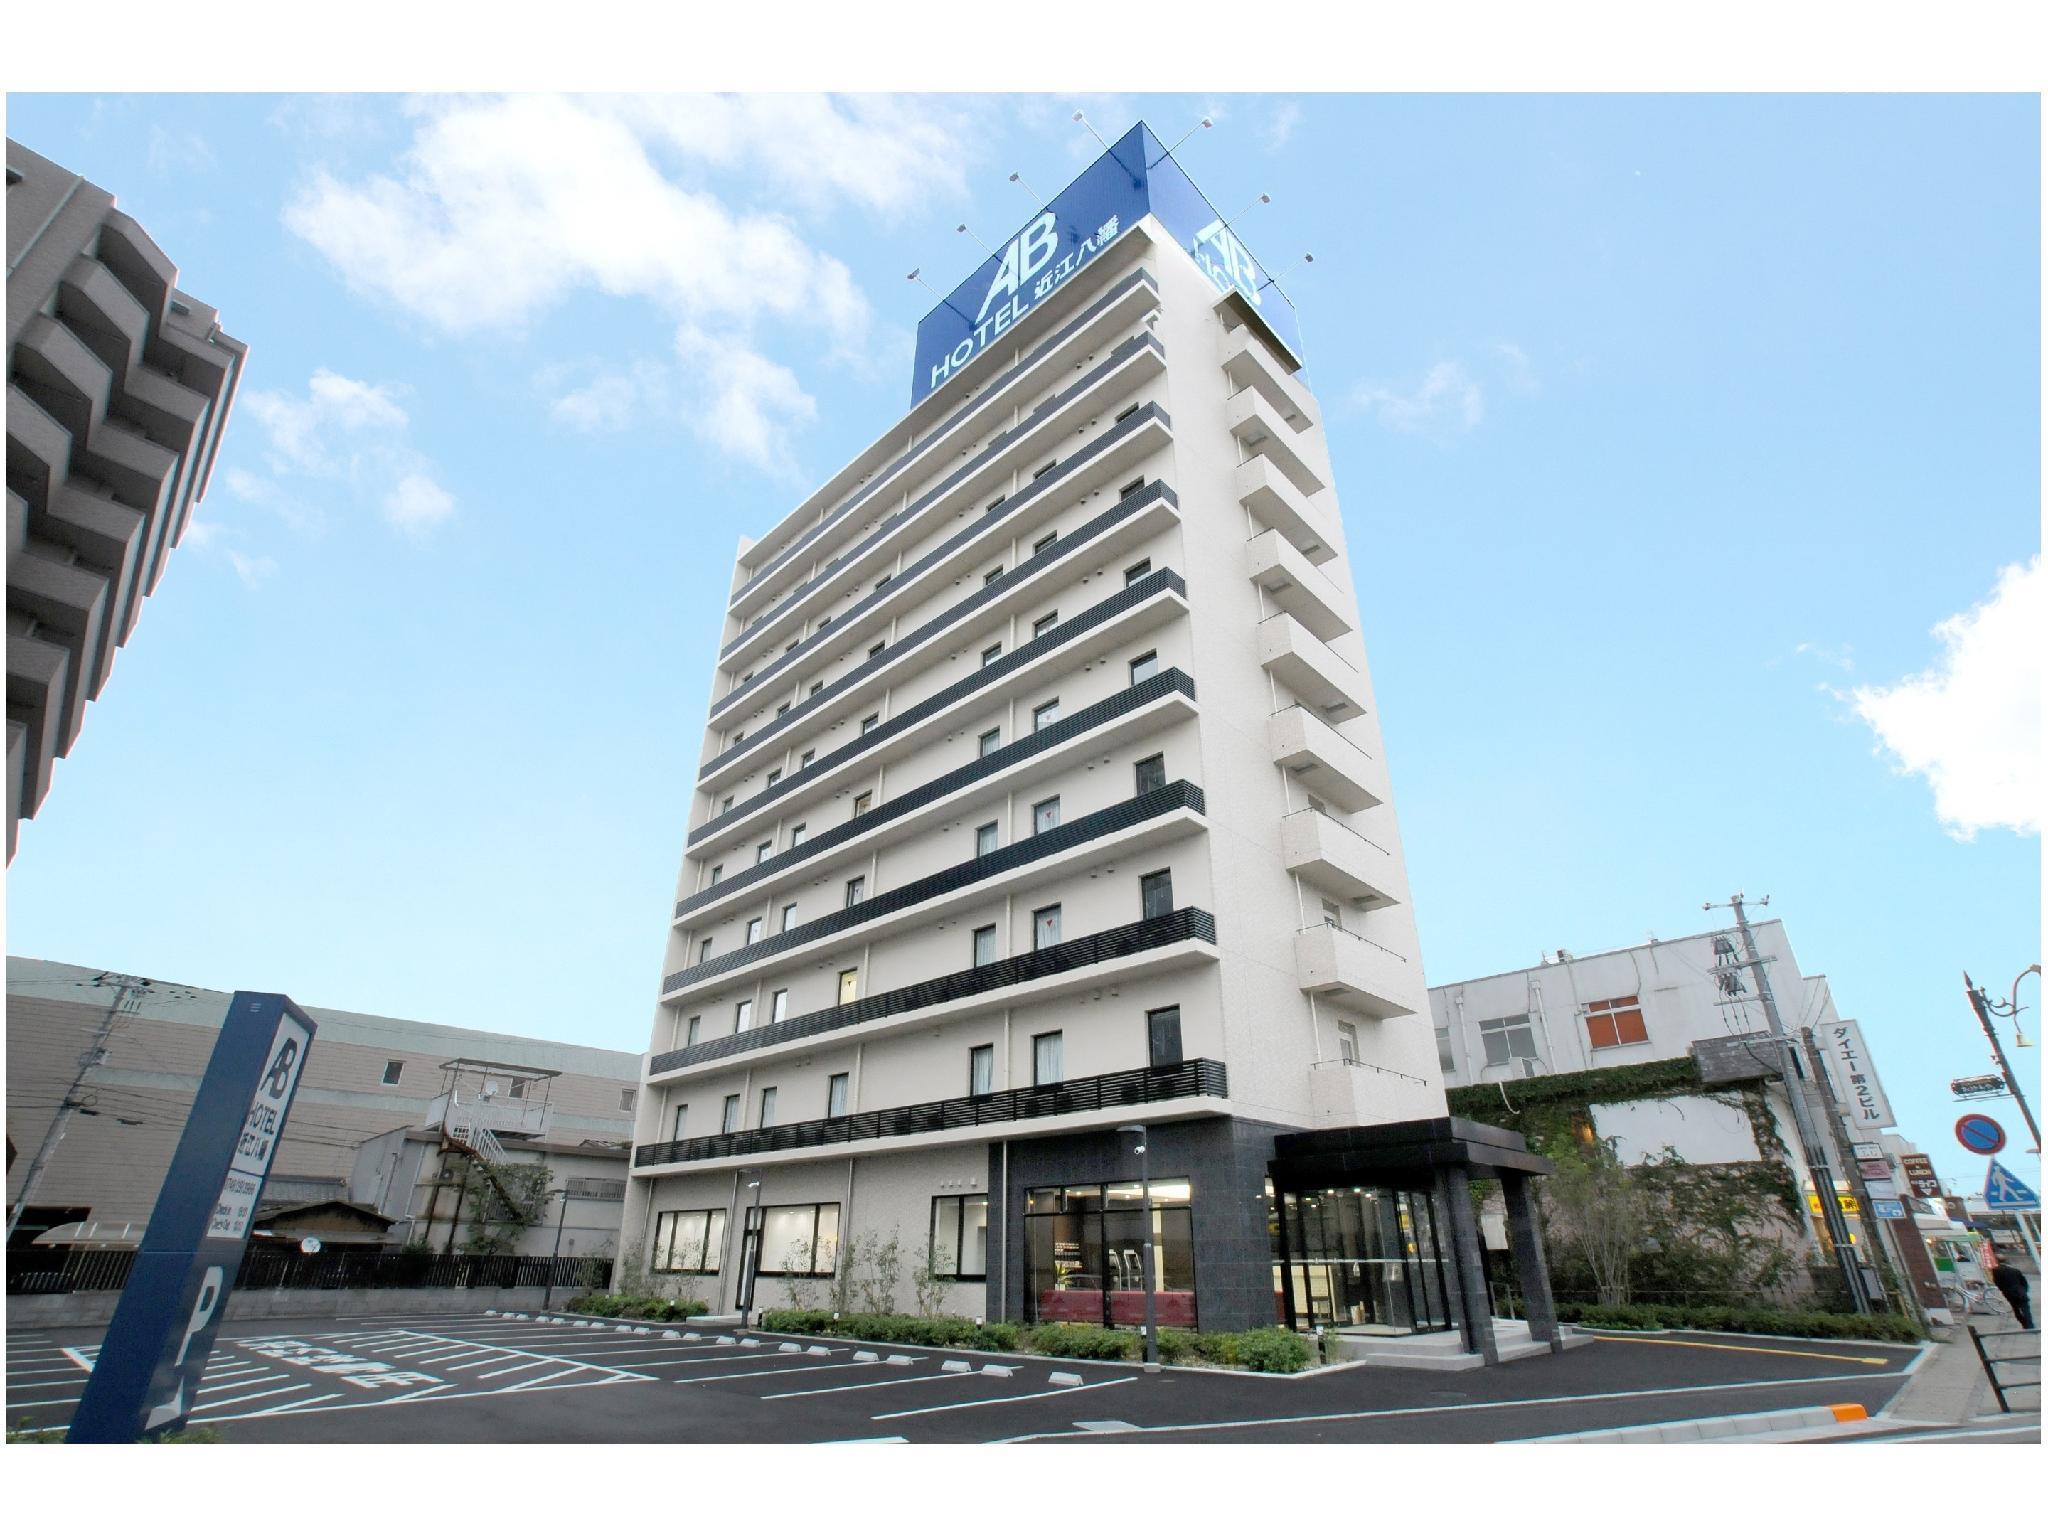 AB Hotel Omihachiman